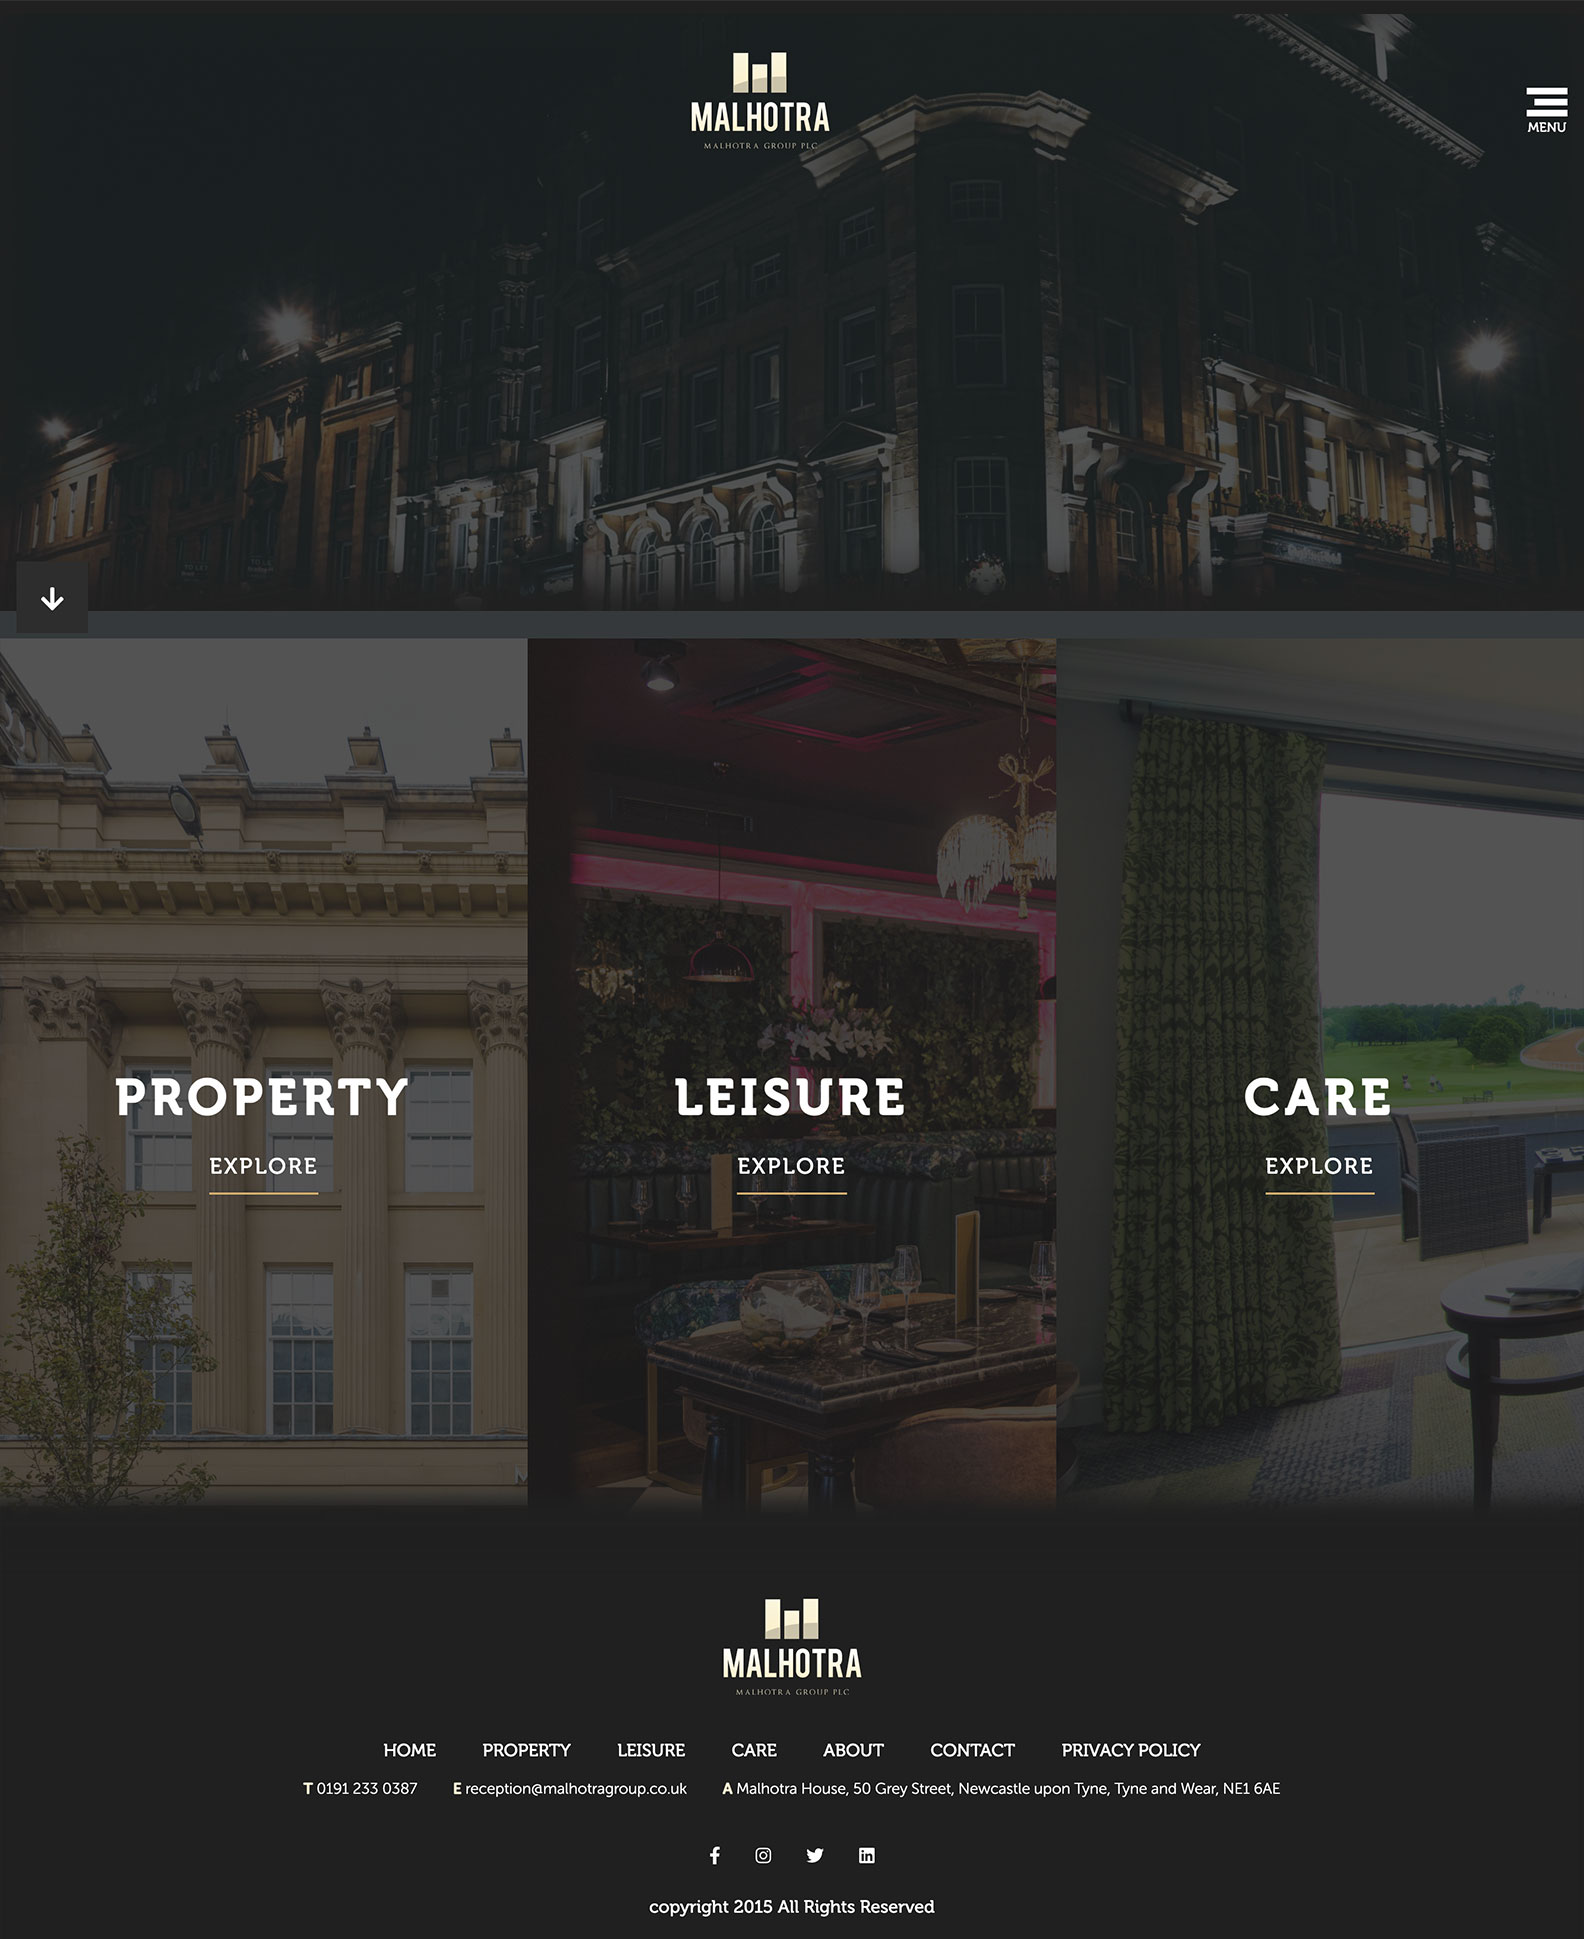 Desktop view of Malhotra Group's website